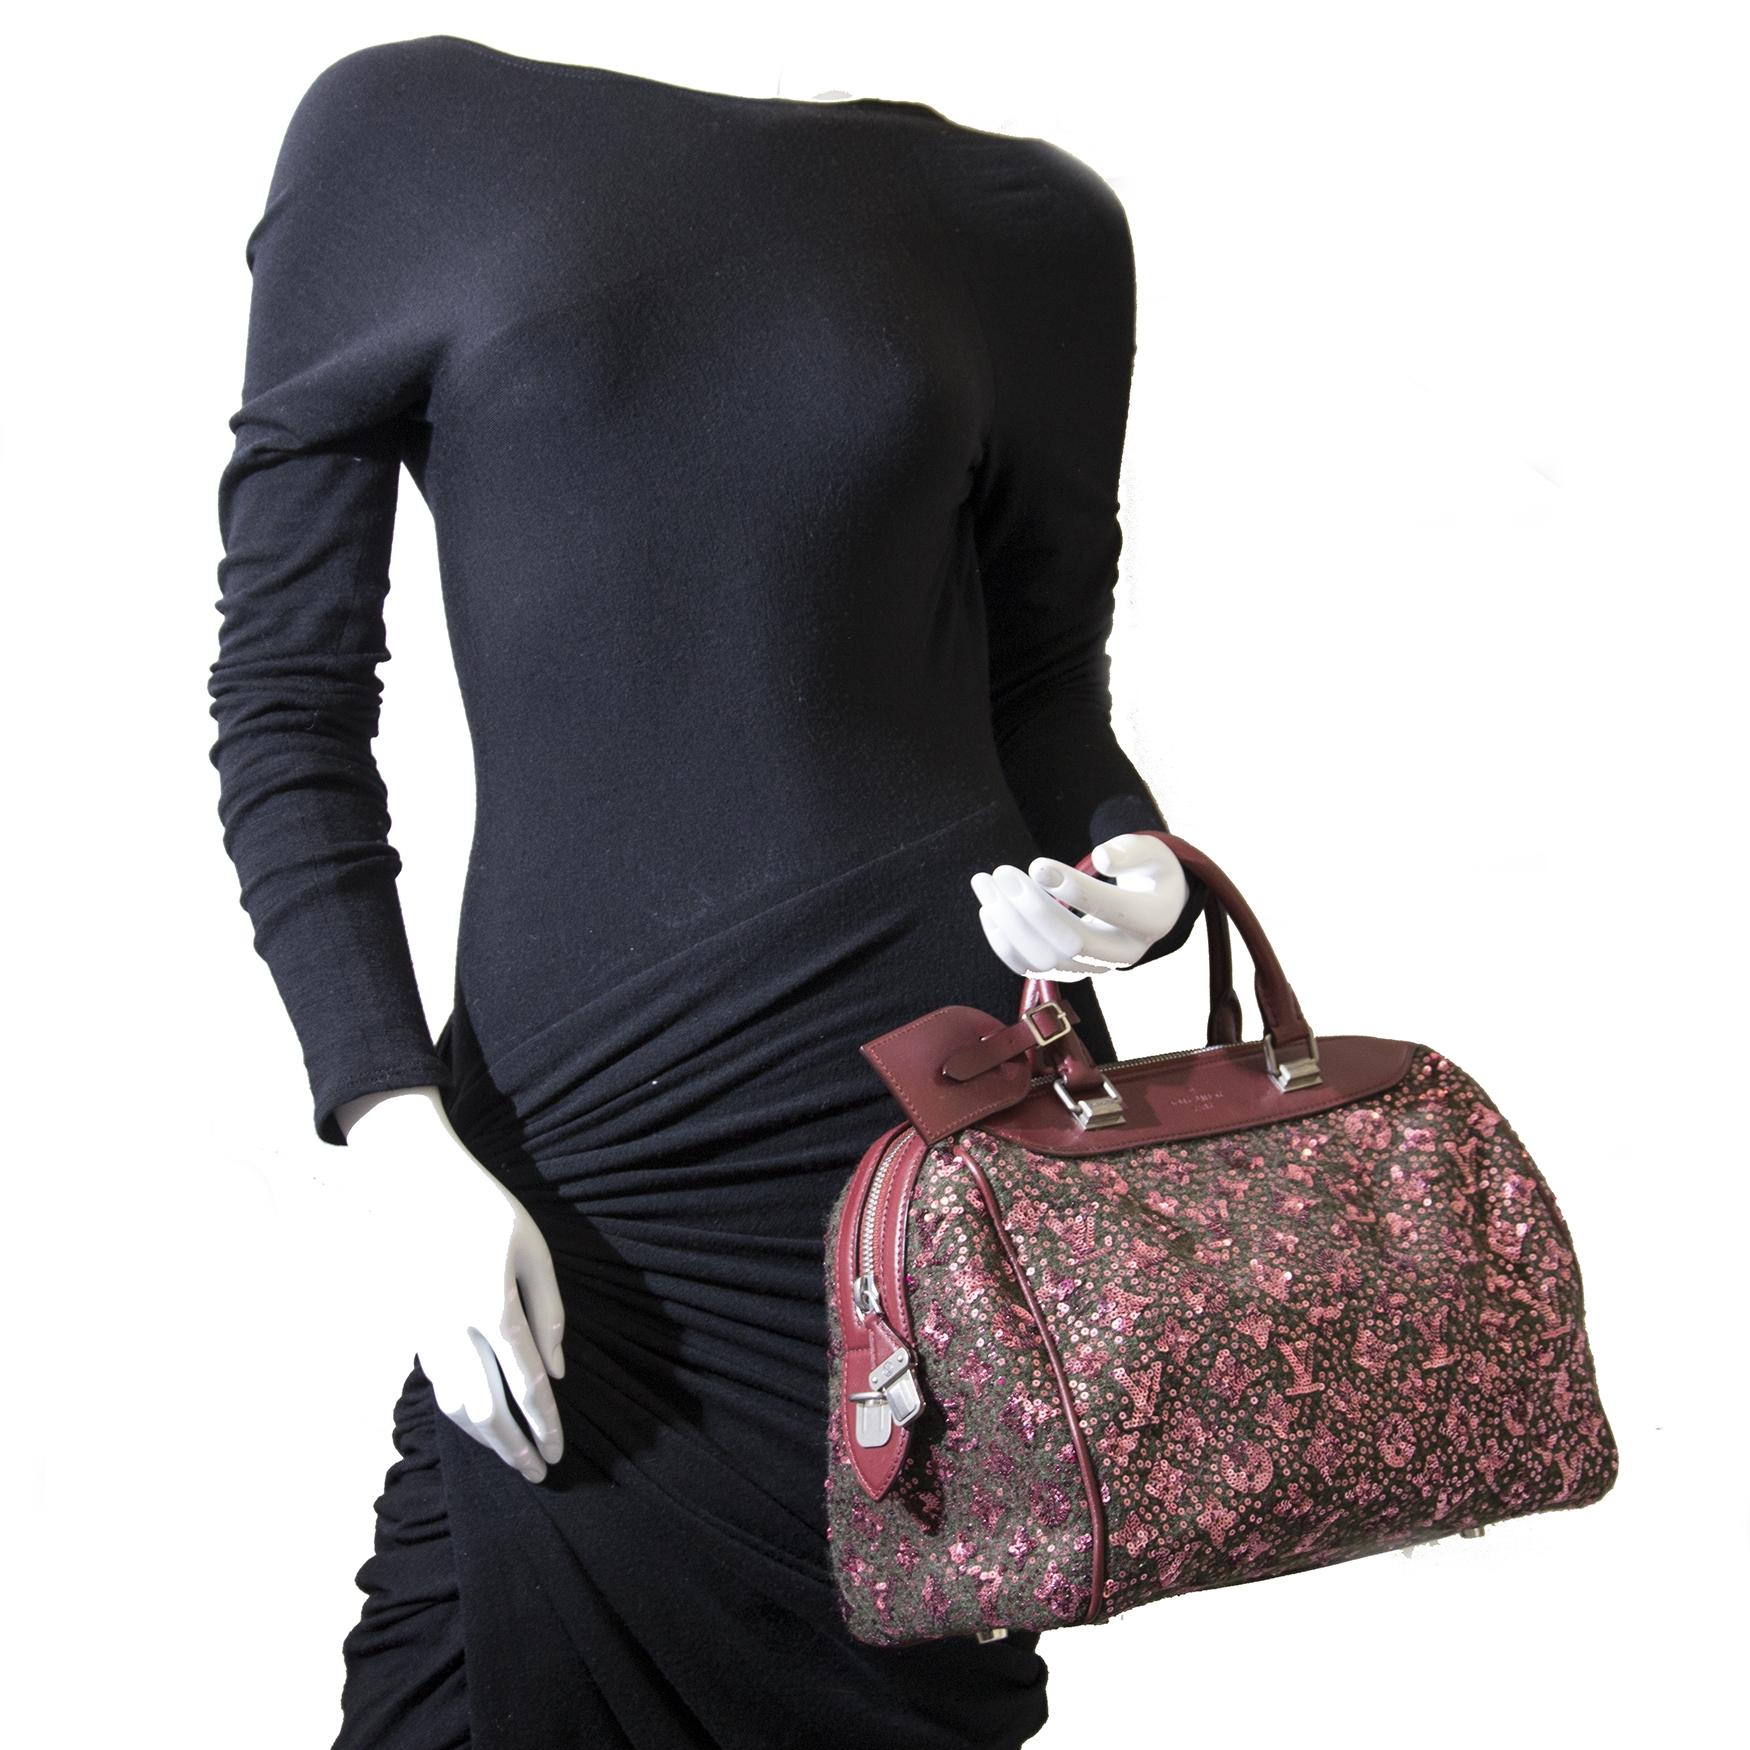 b7785ae5f1e3 Labellov Buy authentic vintage Louis Vuitton online with Labellov ...